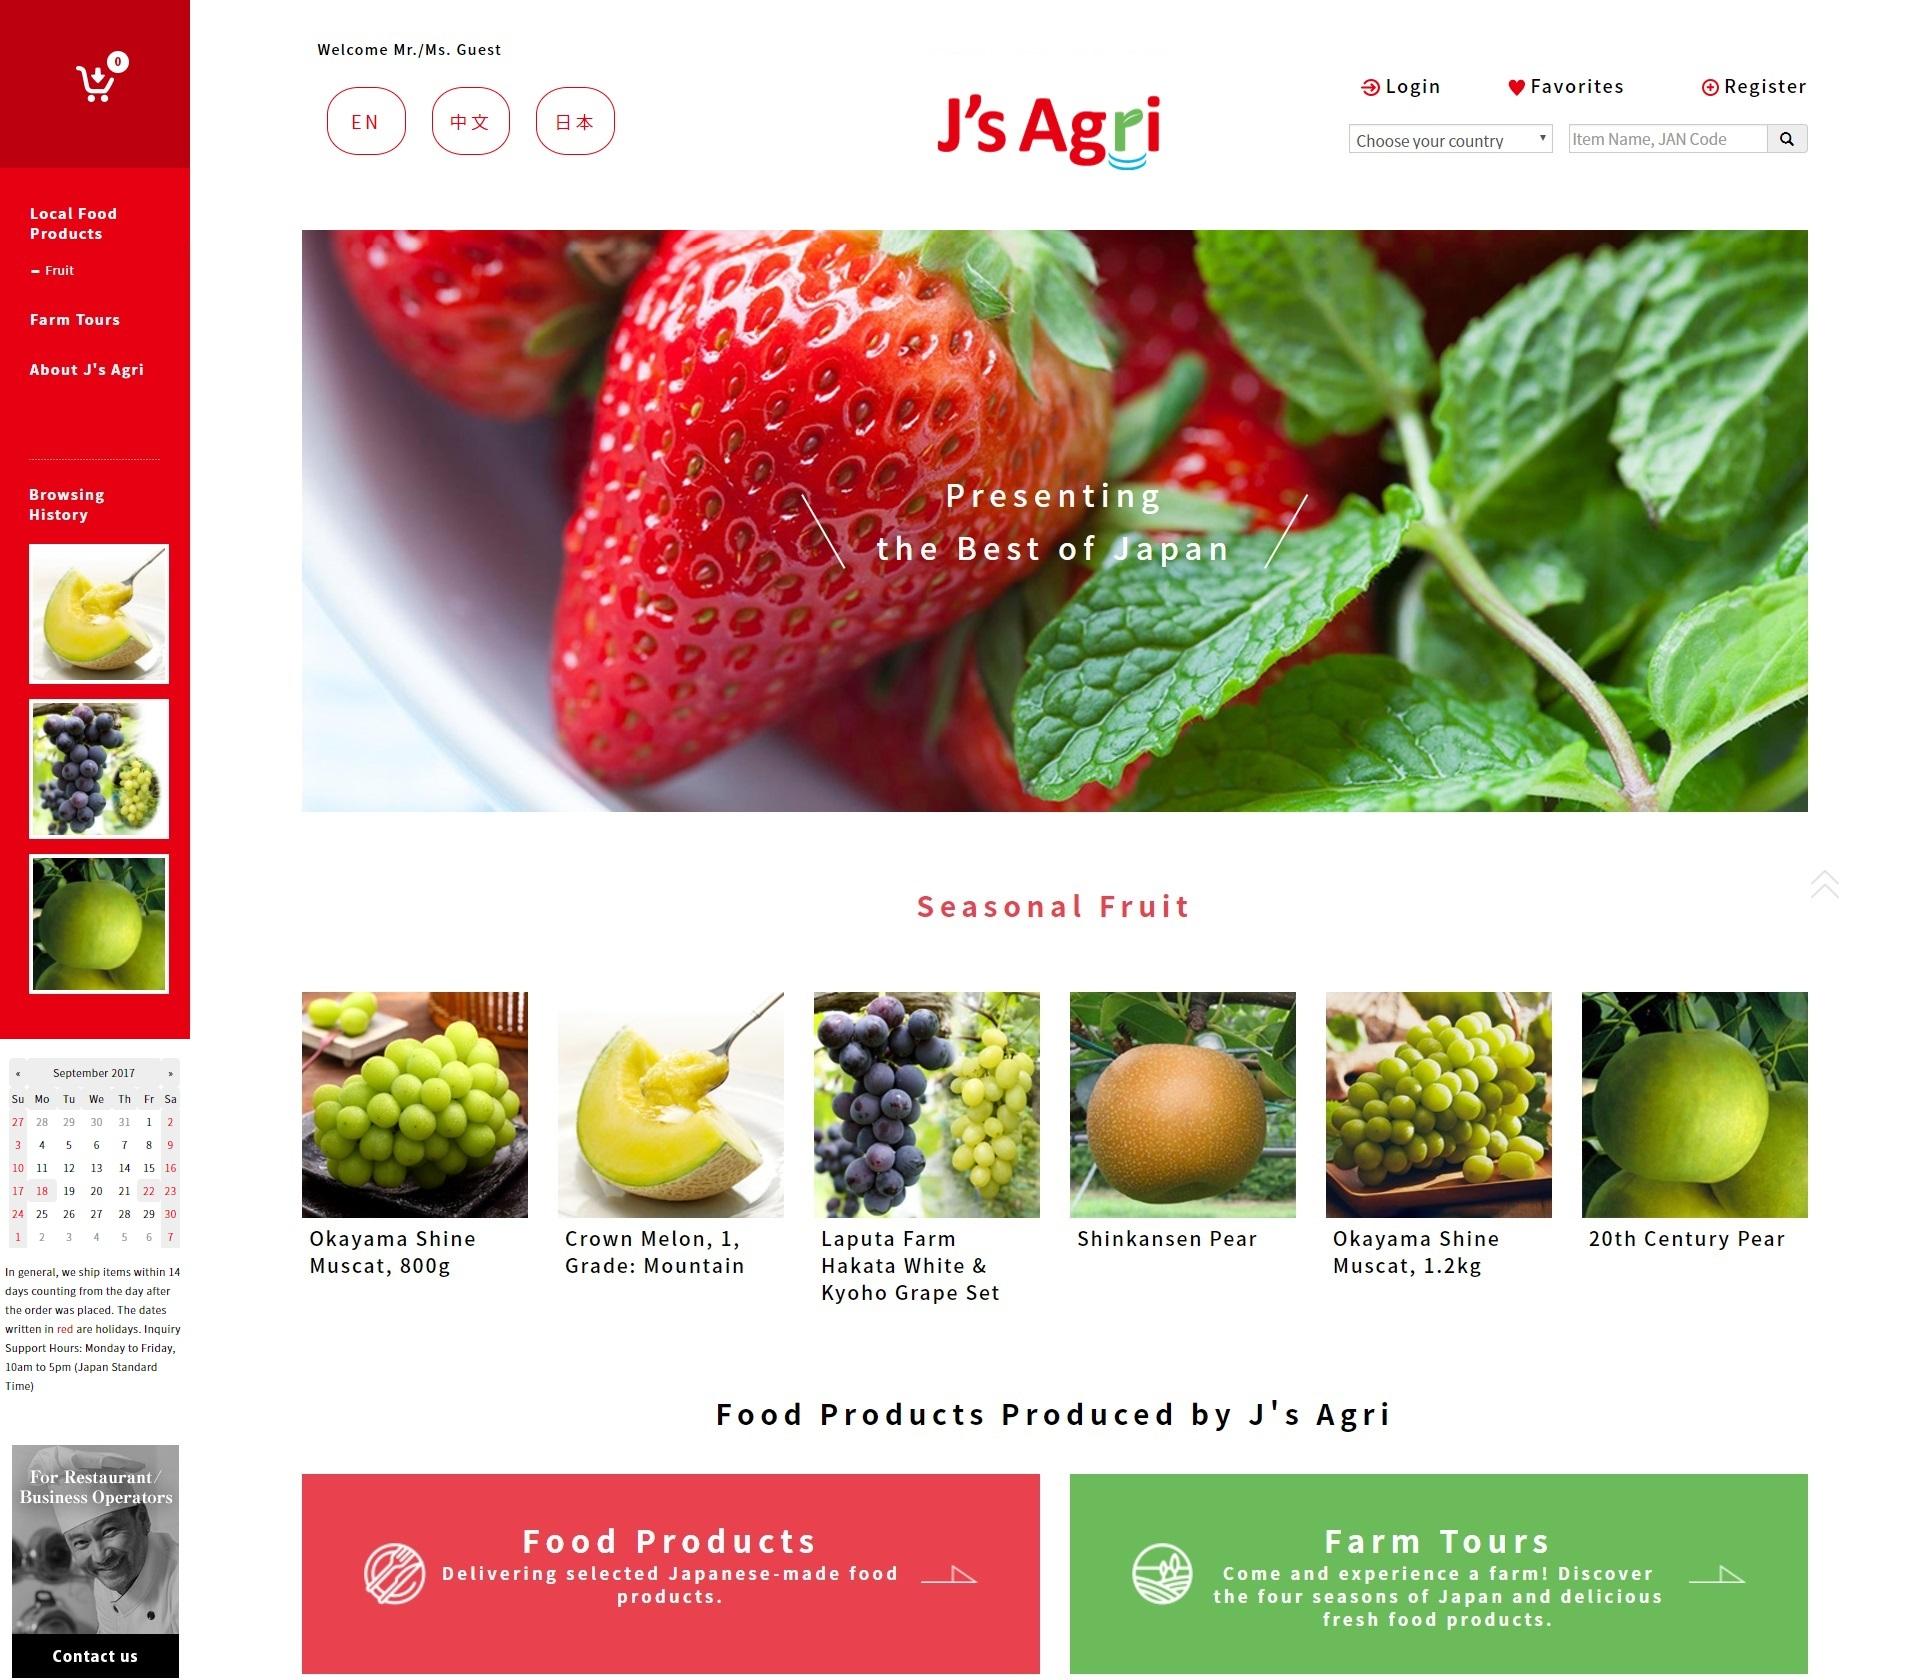 JTB、海外向けに農産物の直販サイトをオープン、岡山産マスカットなど生産者から航空便で輸送